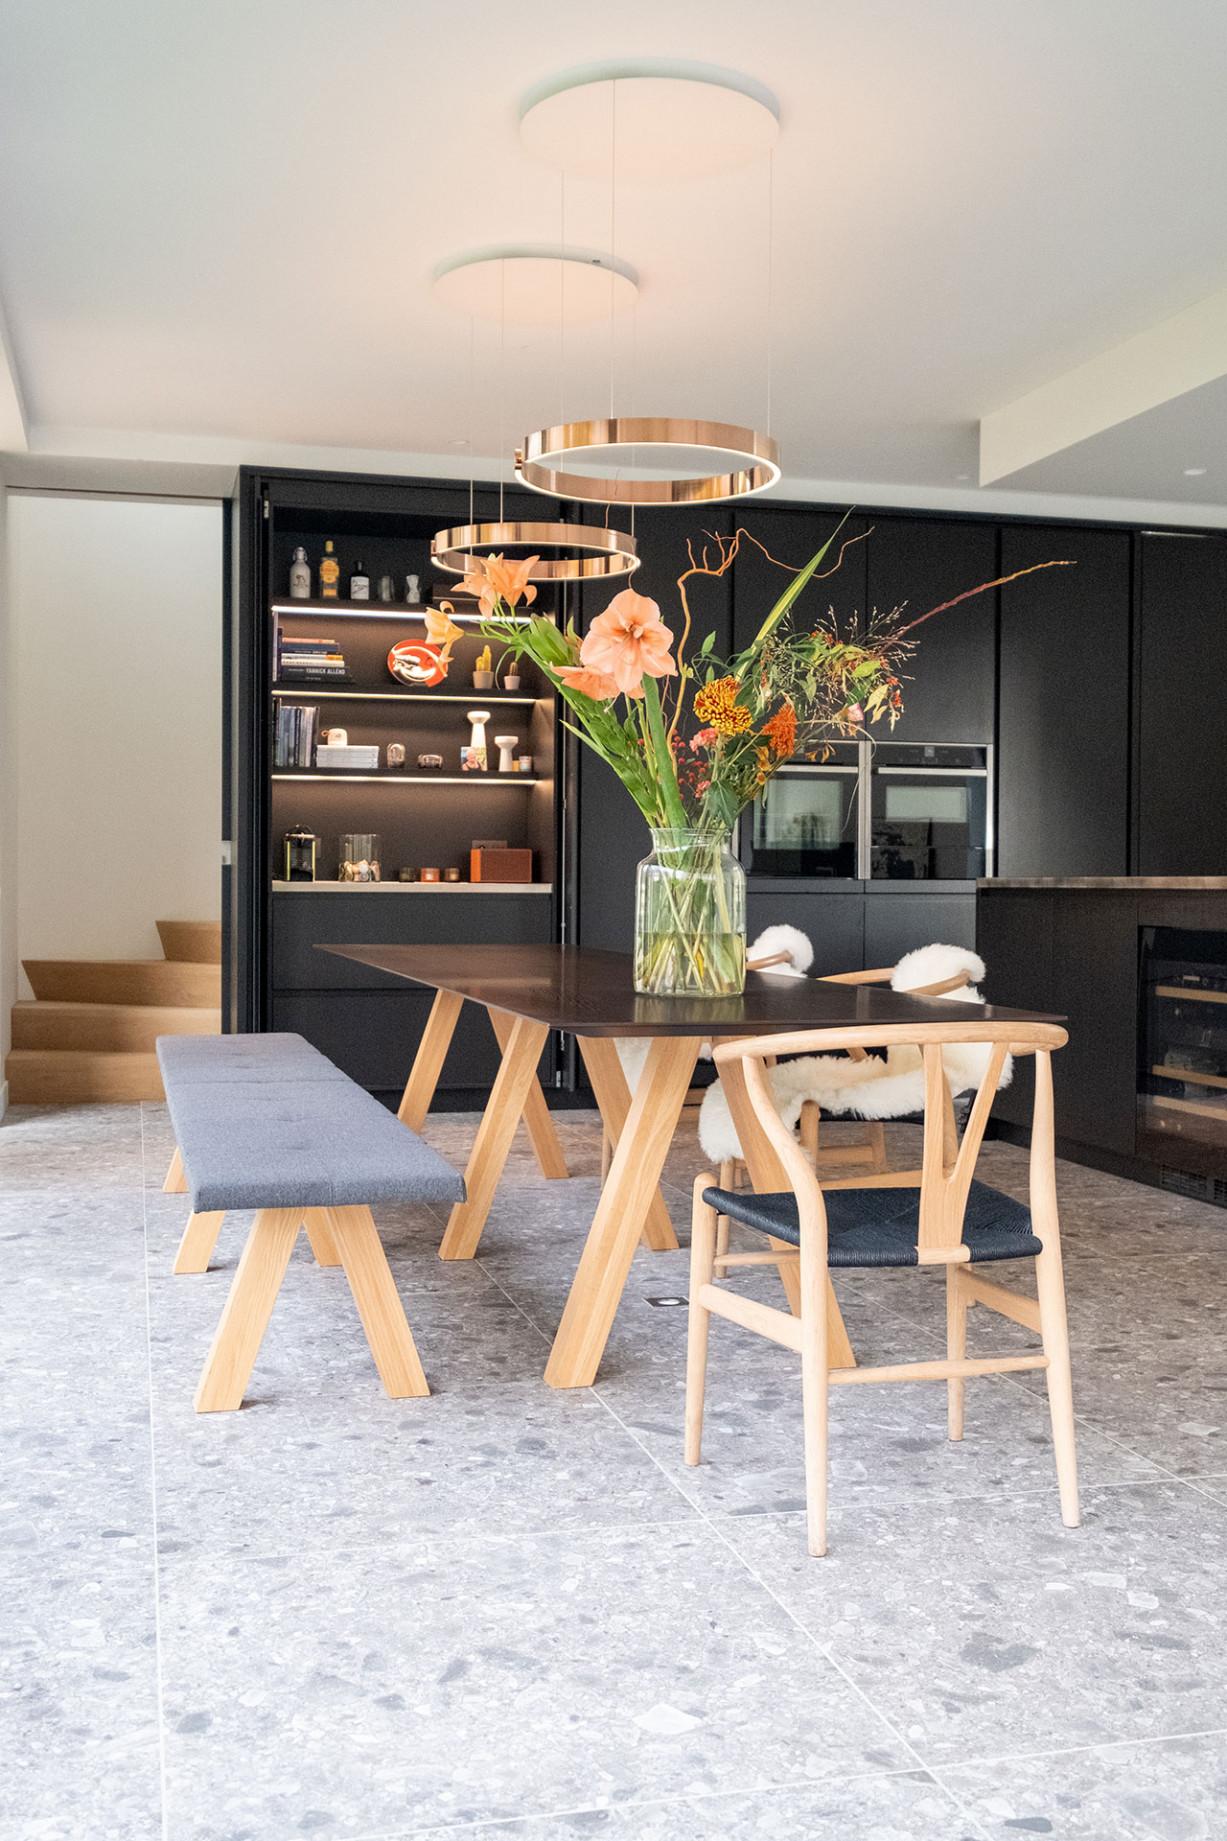 hedendaagse-keuken-fineer-zwart-inox-1.jpg